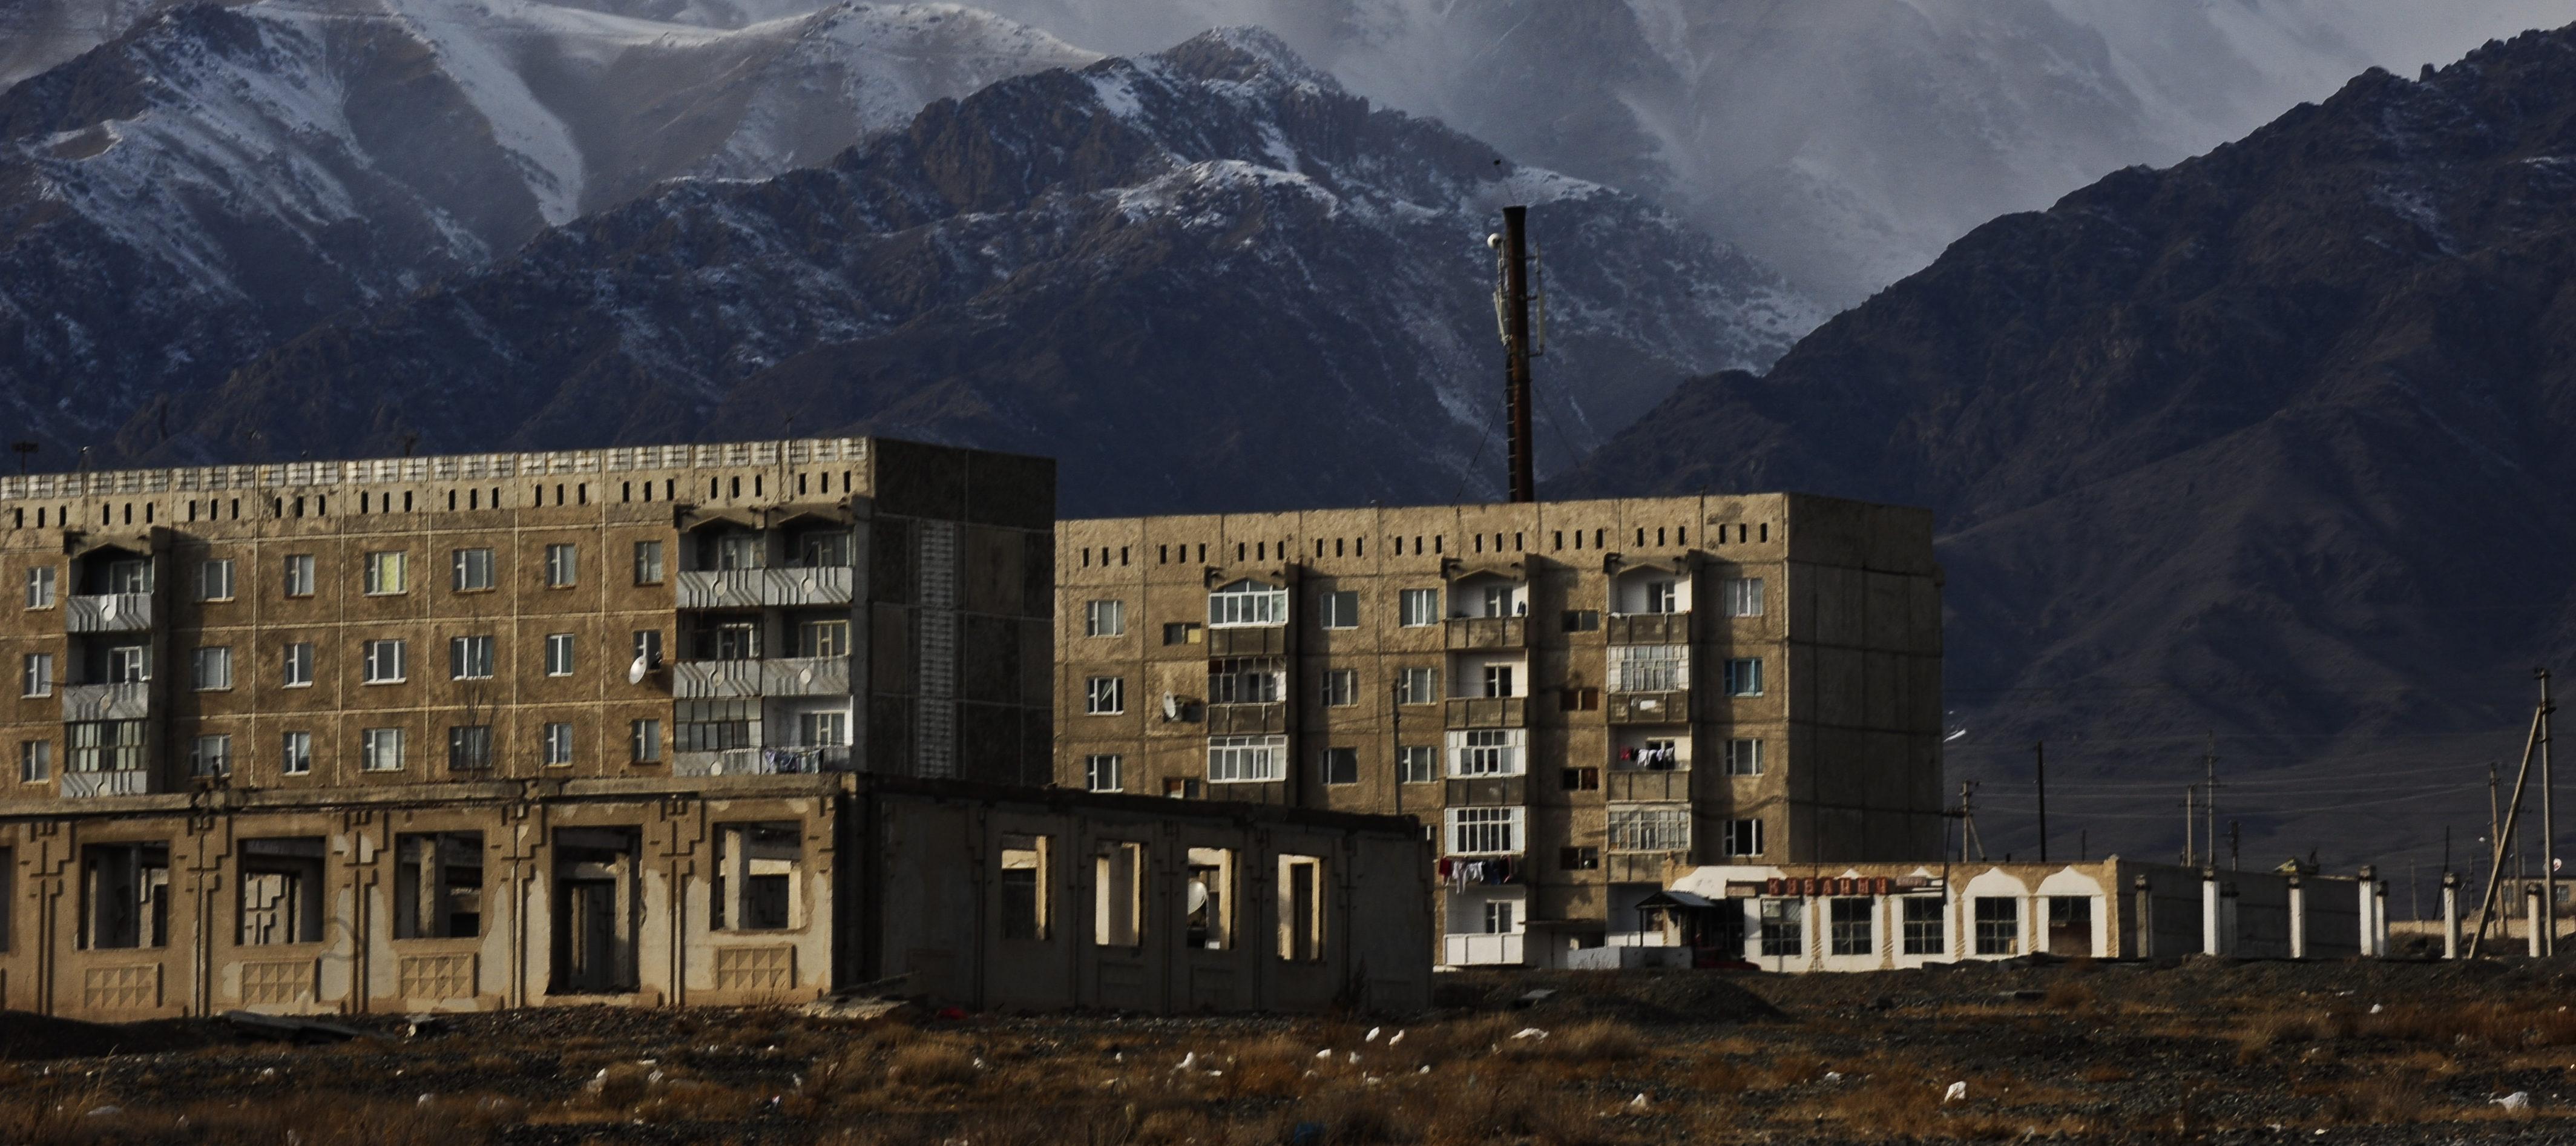 Die Disastermappers katografieren Krisenregionen, wie jüngt Kirgististan. Bild: wikimediacommons, U.S. Air Force Photo/Staff Sgt. Angela Ruiz